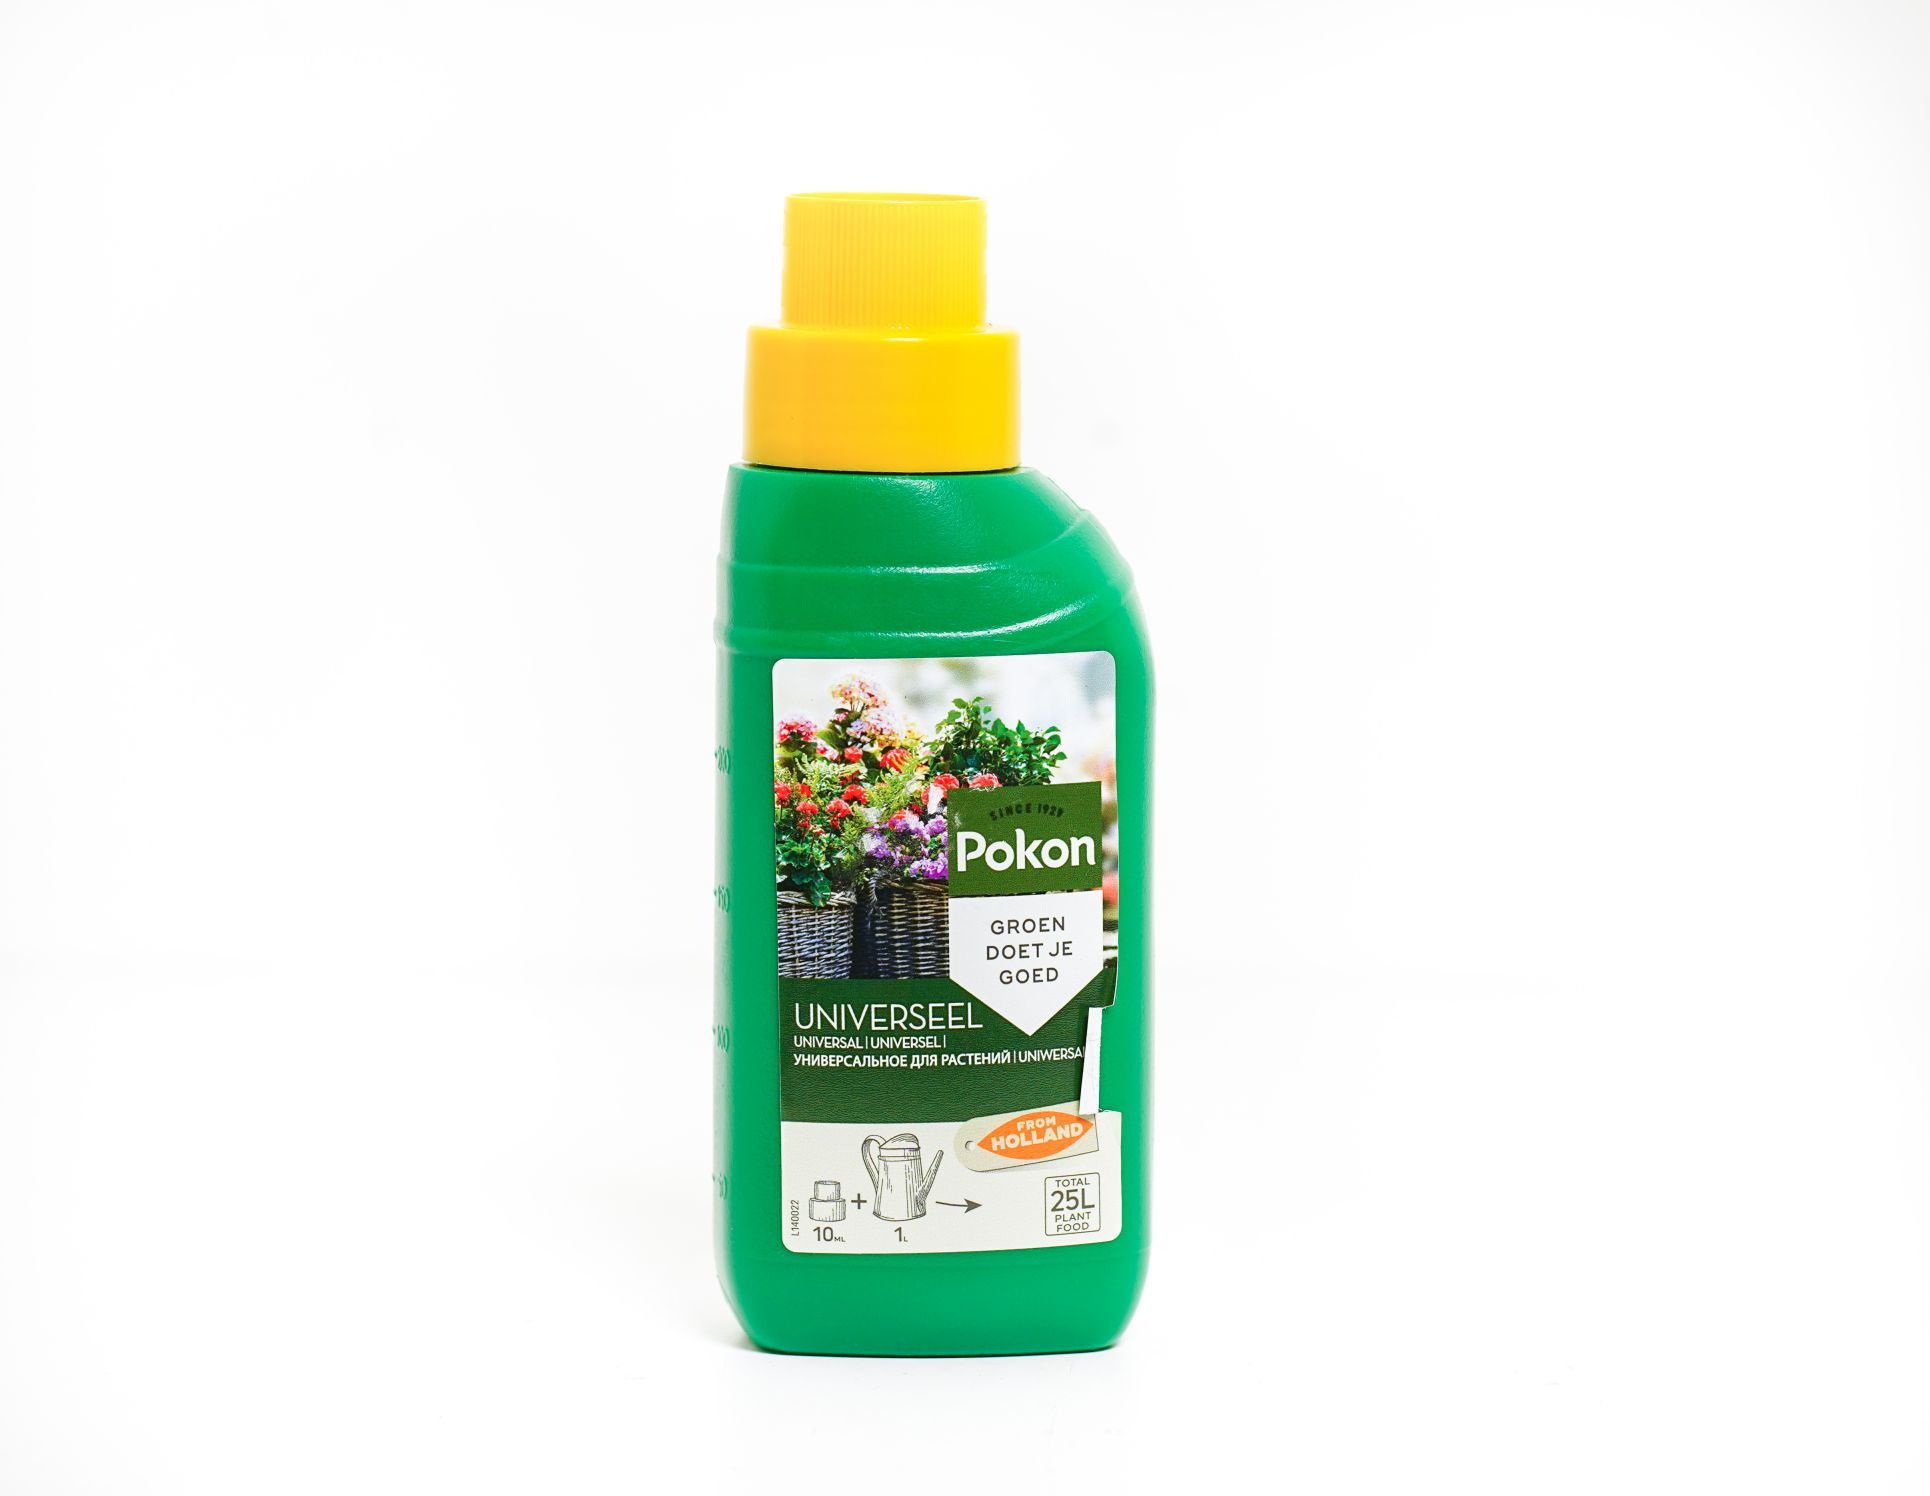 Pokon Universal S Soil Fertilizer Pesticide